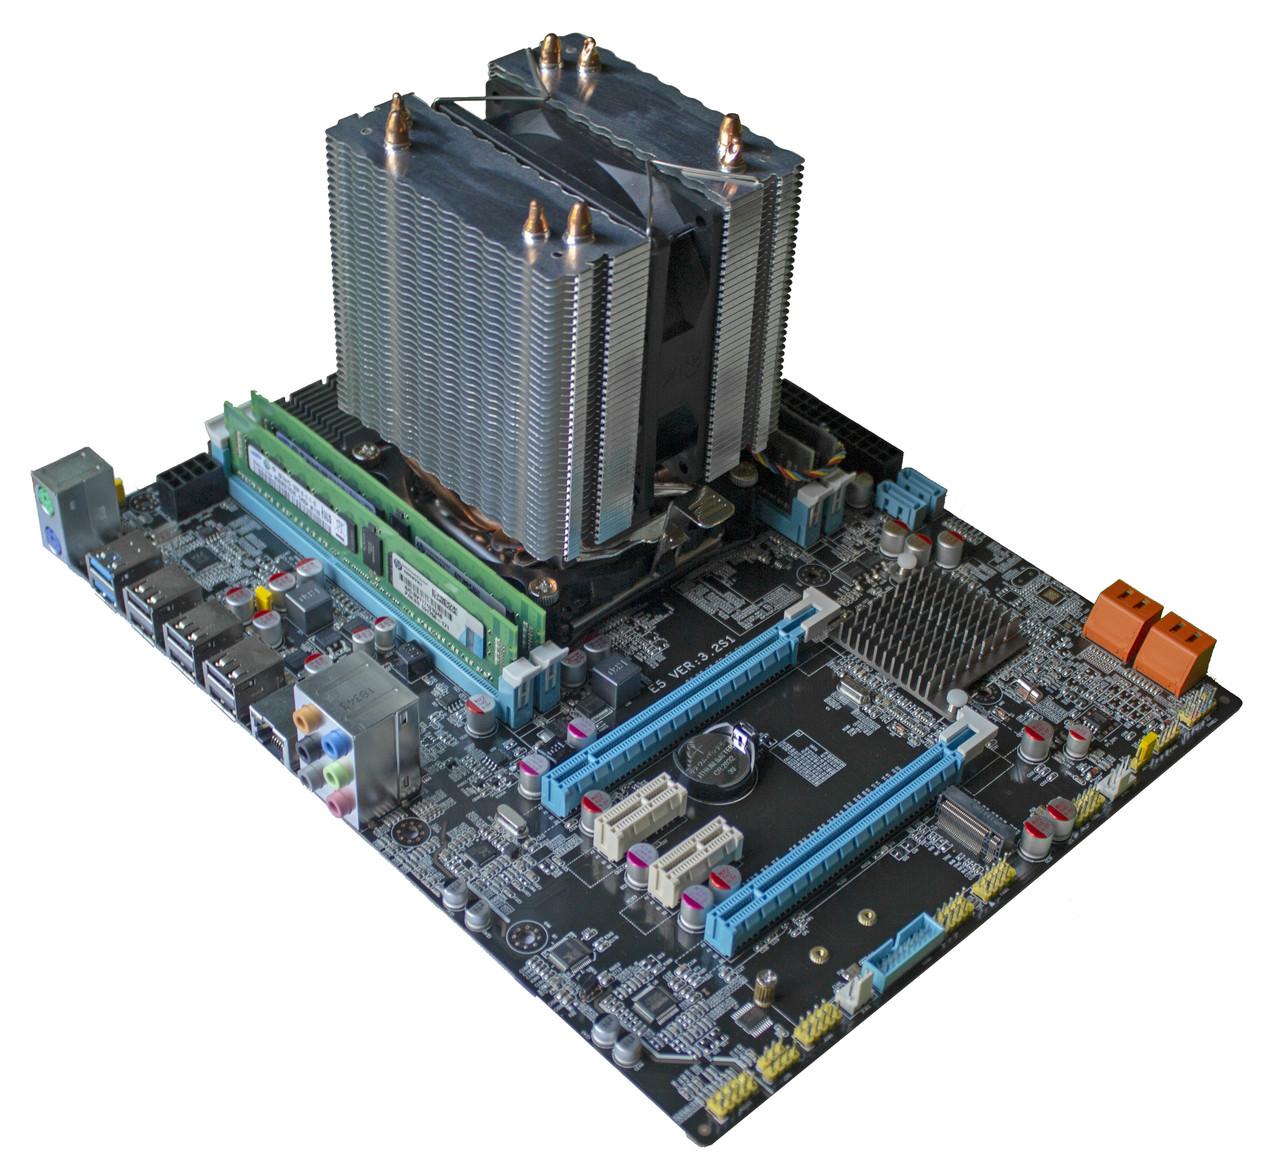 Комплект X79Z-2.4F + Xeon E5-2650v2 + 16 GB RAM + Кулер, LGA 2011